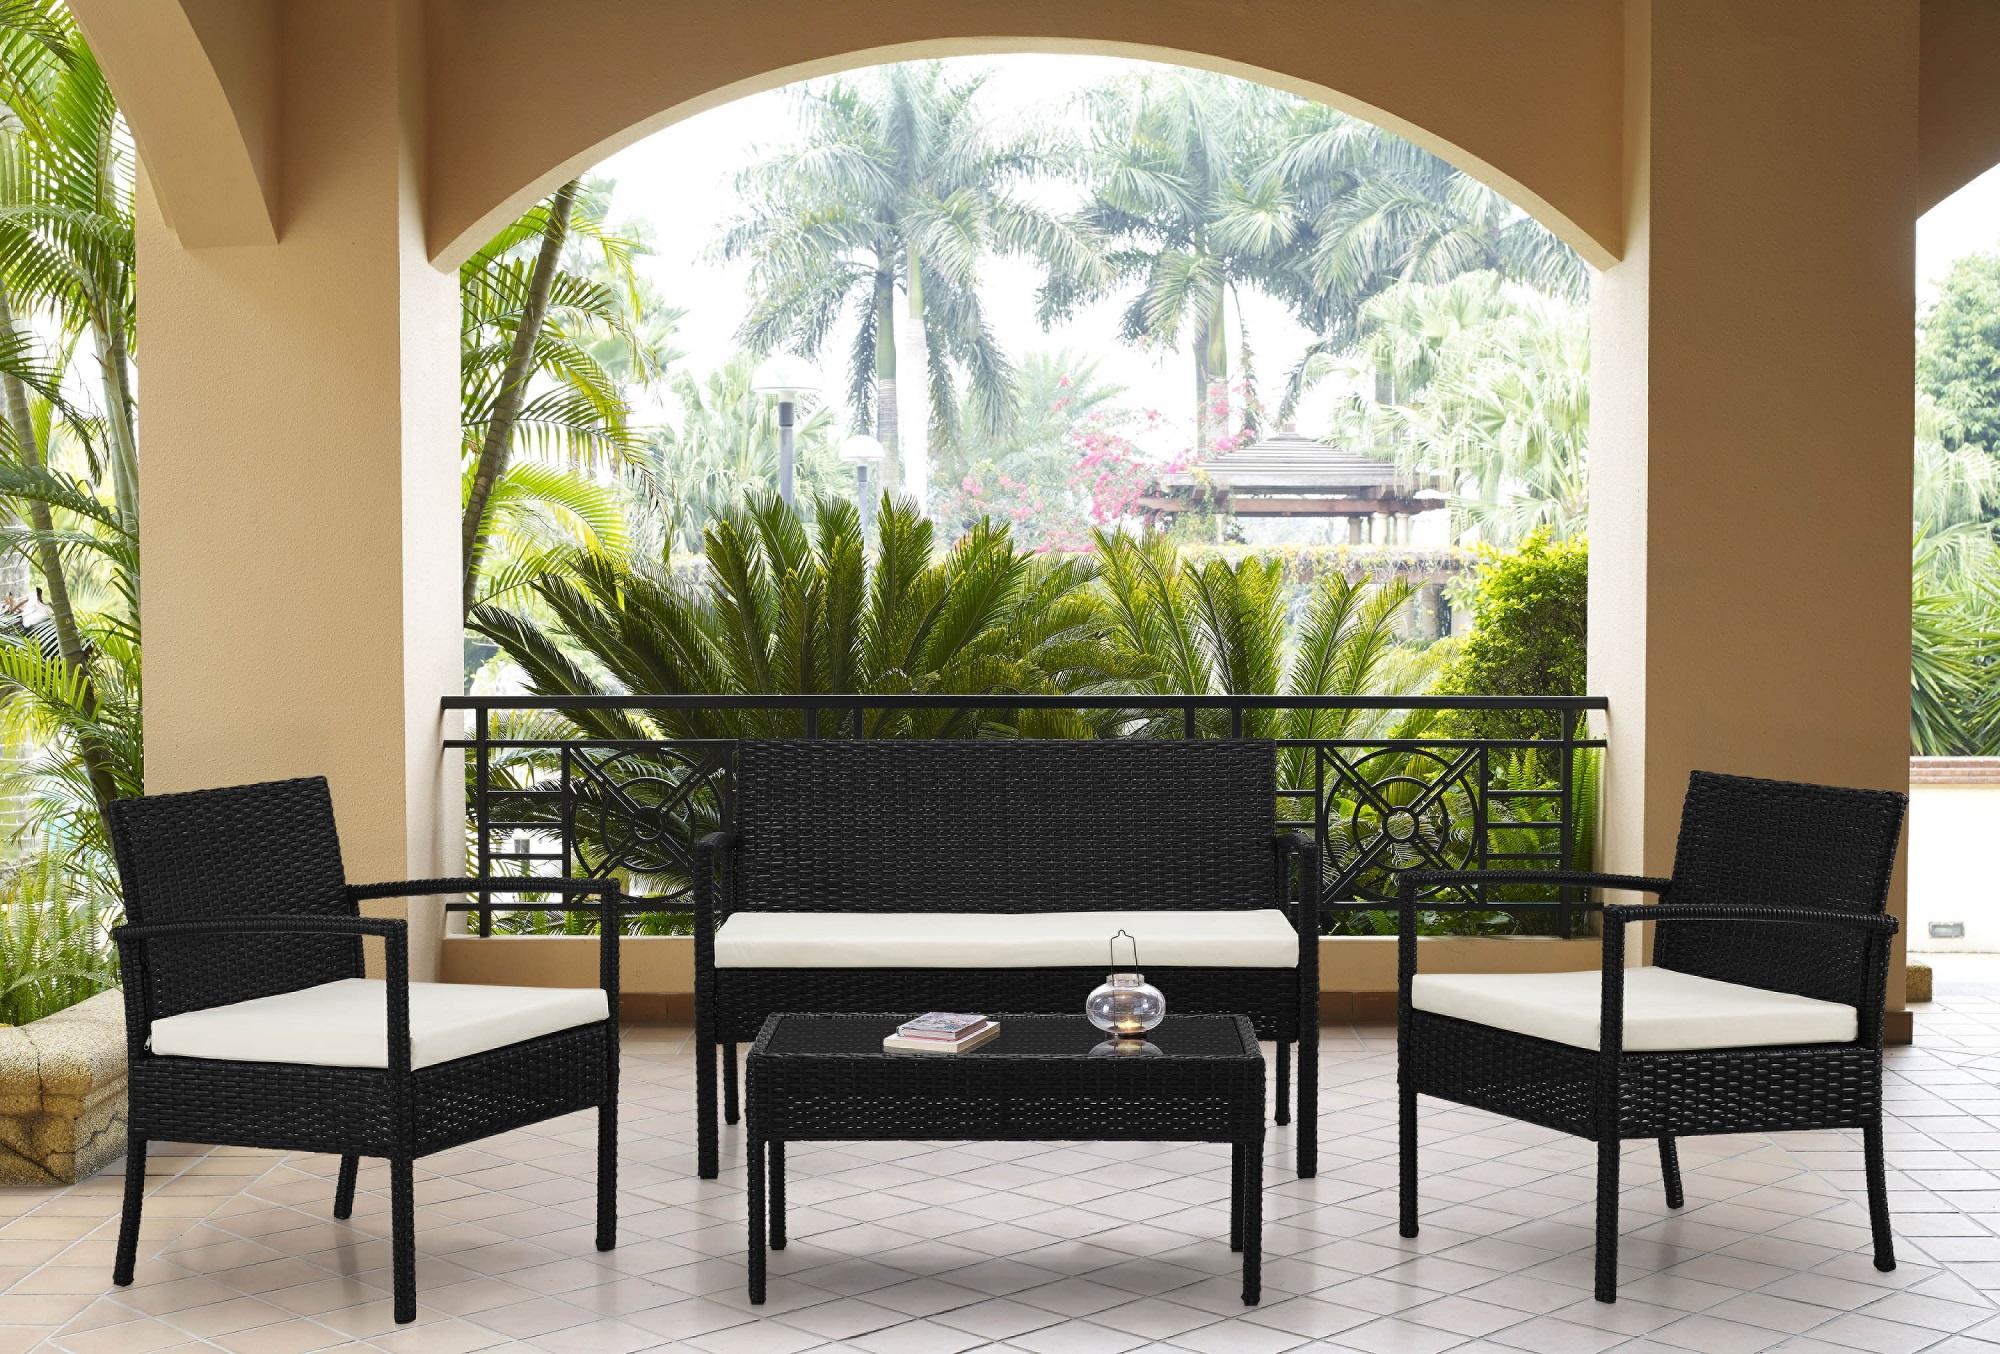 THE HOM Teaset 4-Pc Patio Conversation Set, White Cushions